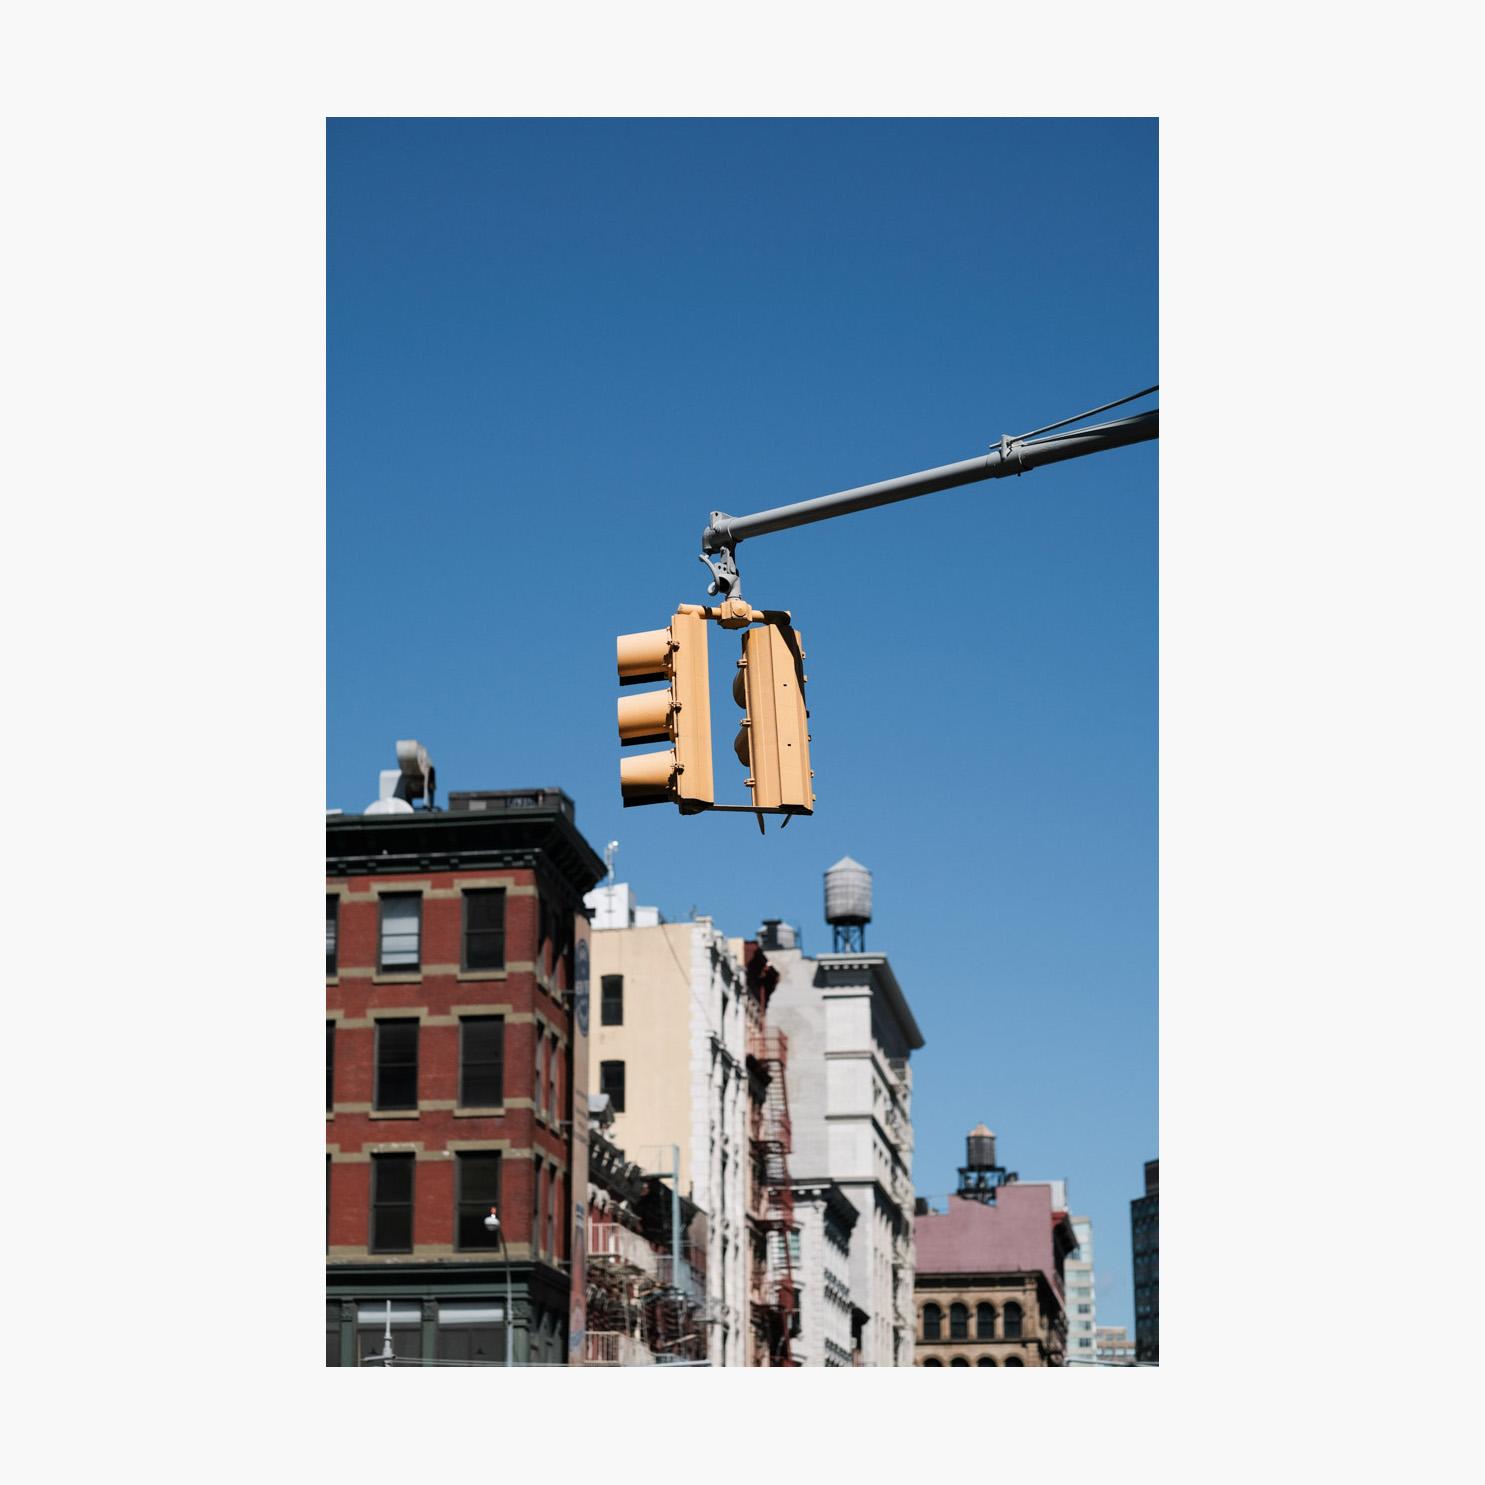 ©-2018-Harry-W-Edmonds-London-Photographer-Missing-the-Shot-PN09.jpg